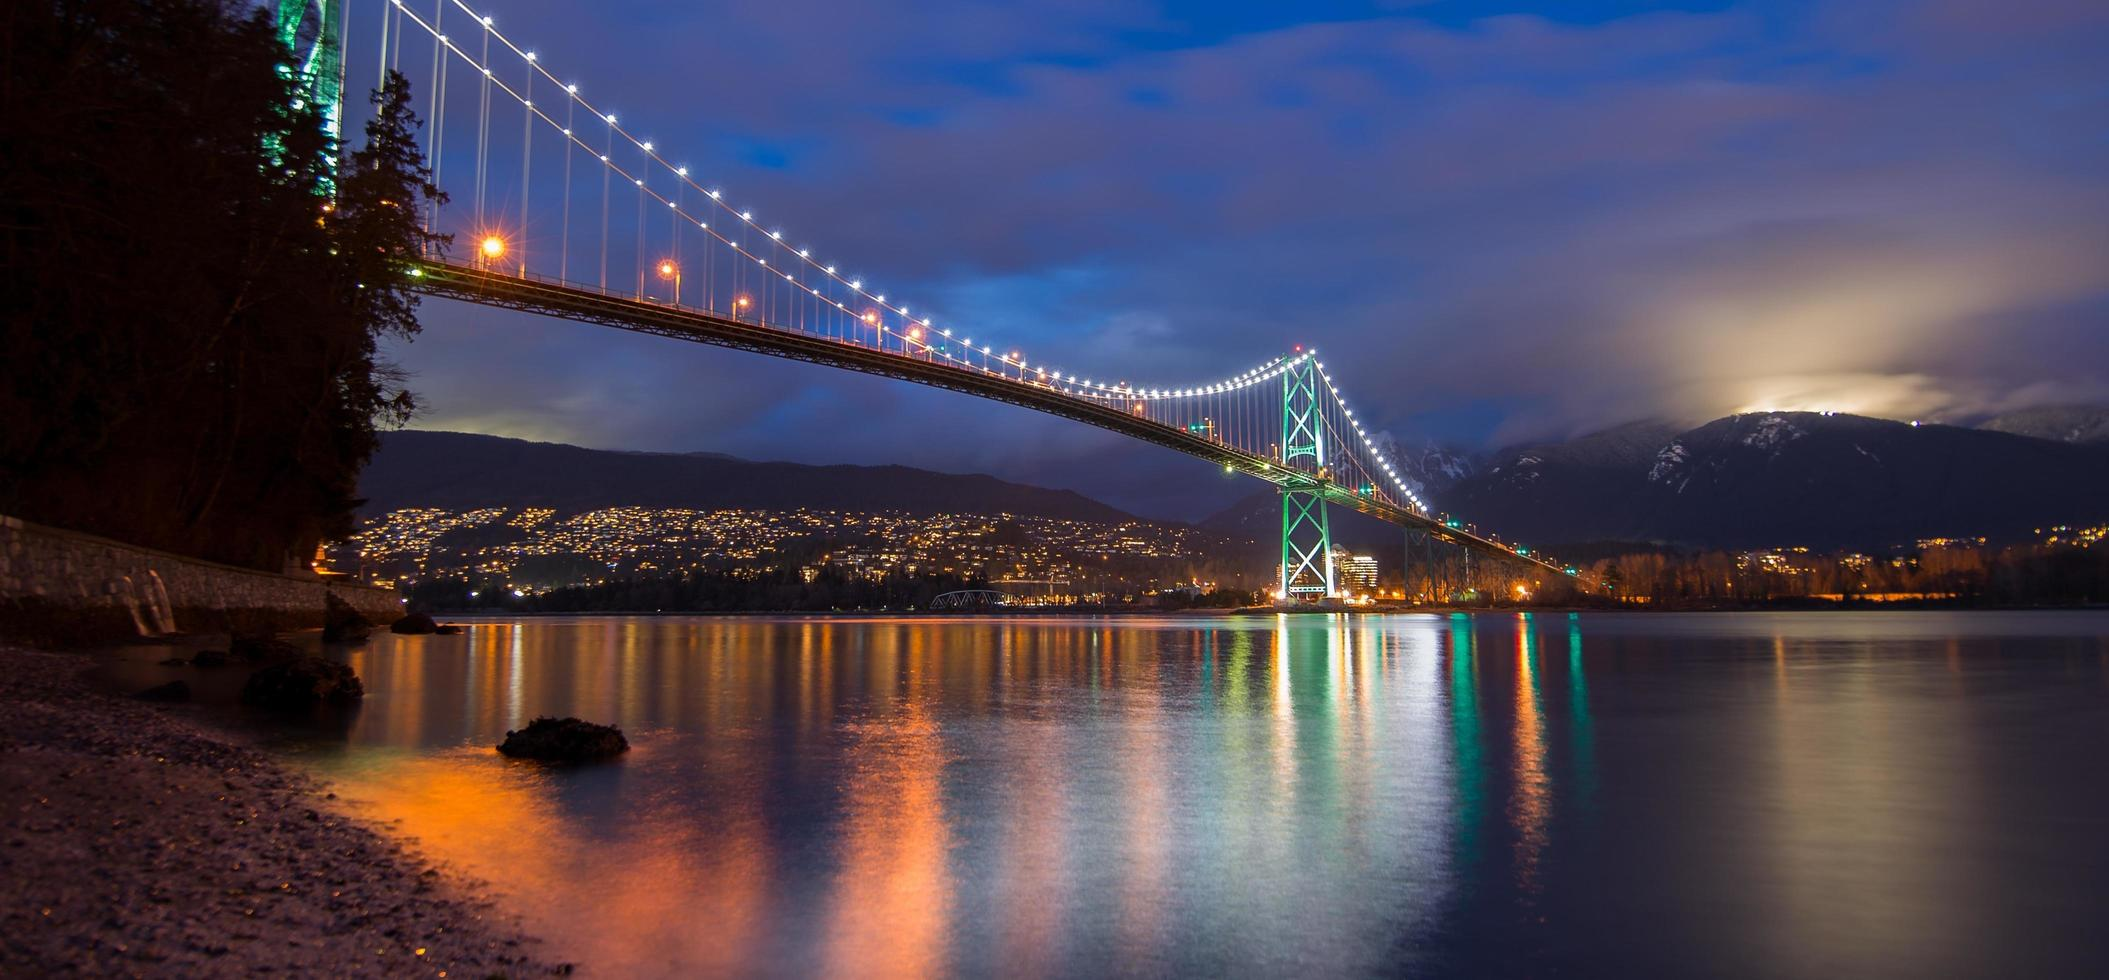 golden gate bridge 's nachts foto